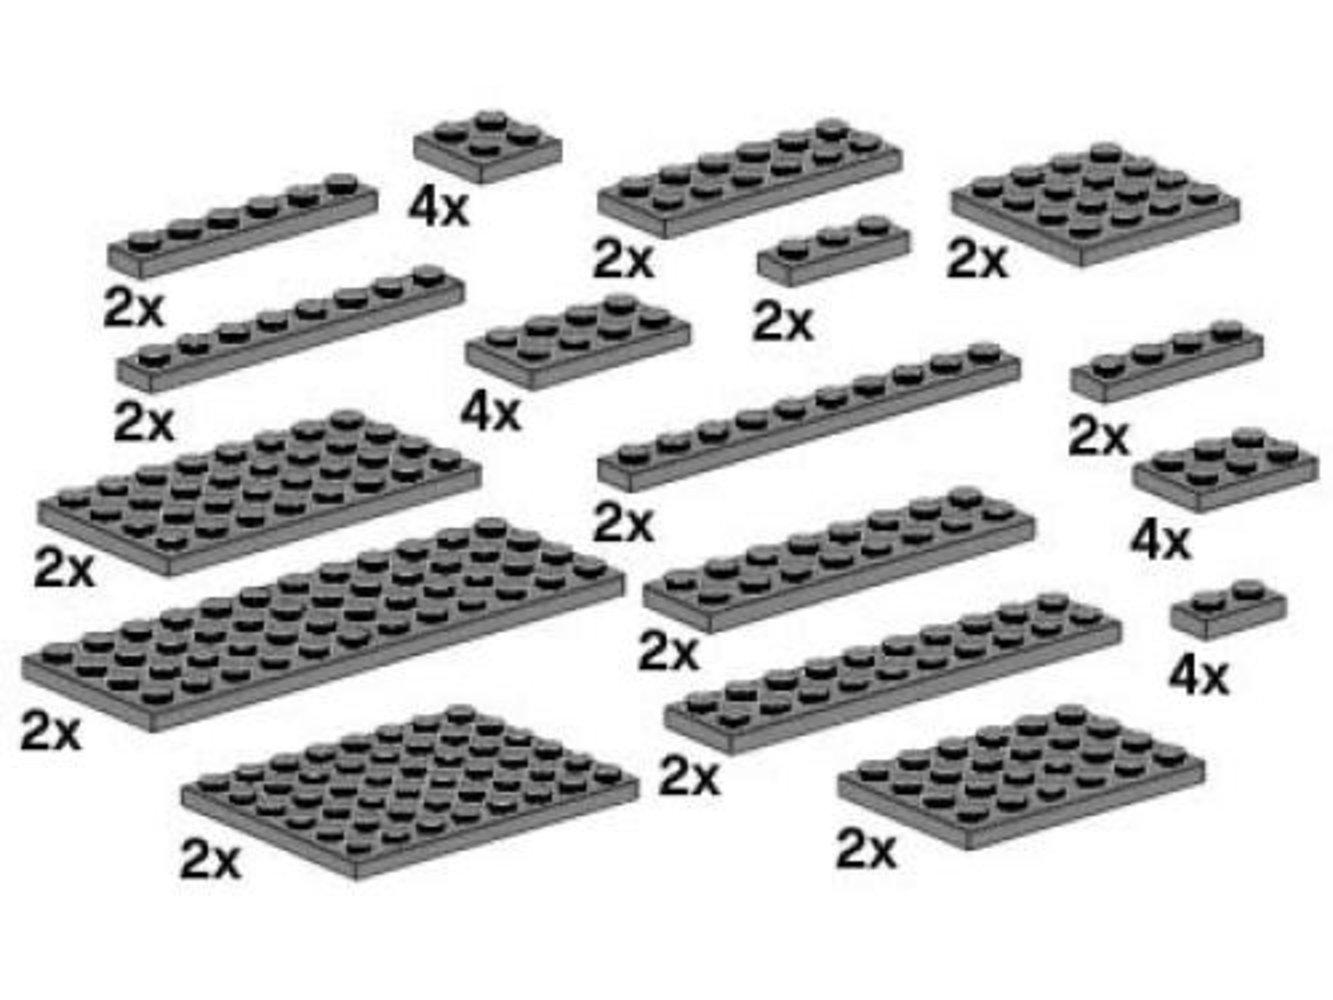 Assorted Dark Gray Plates